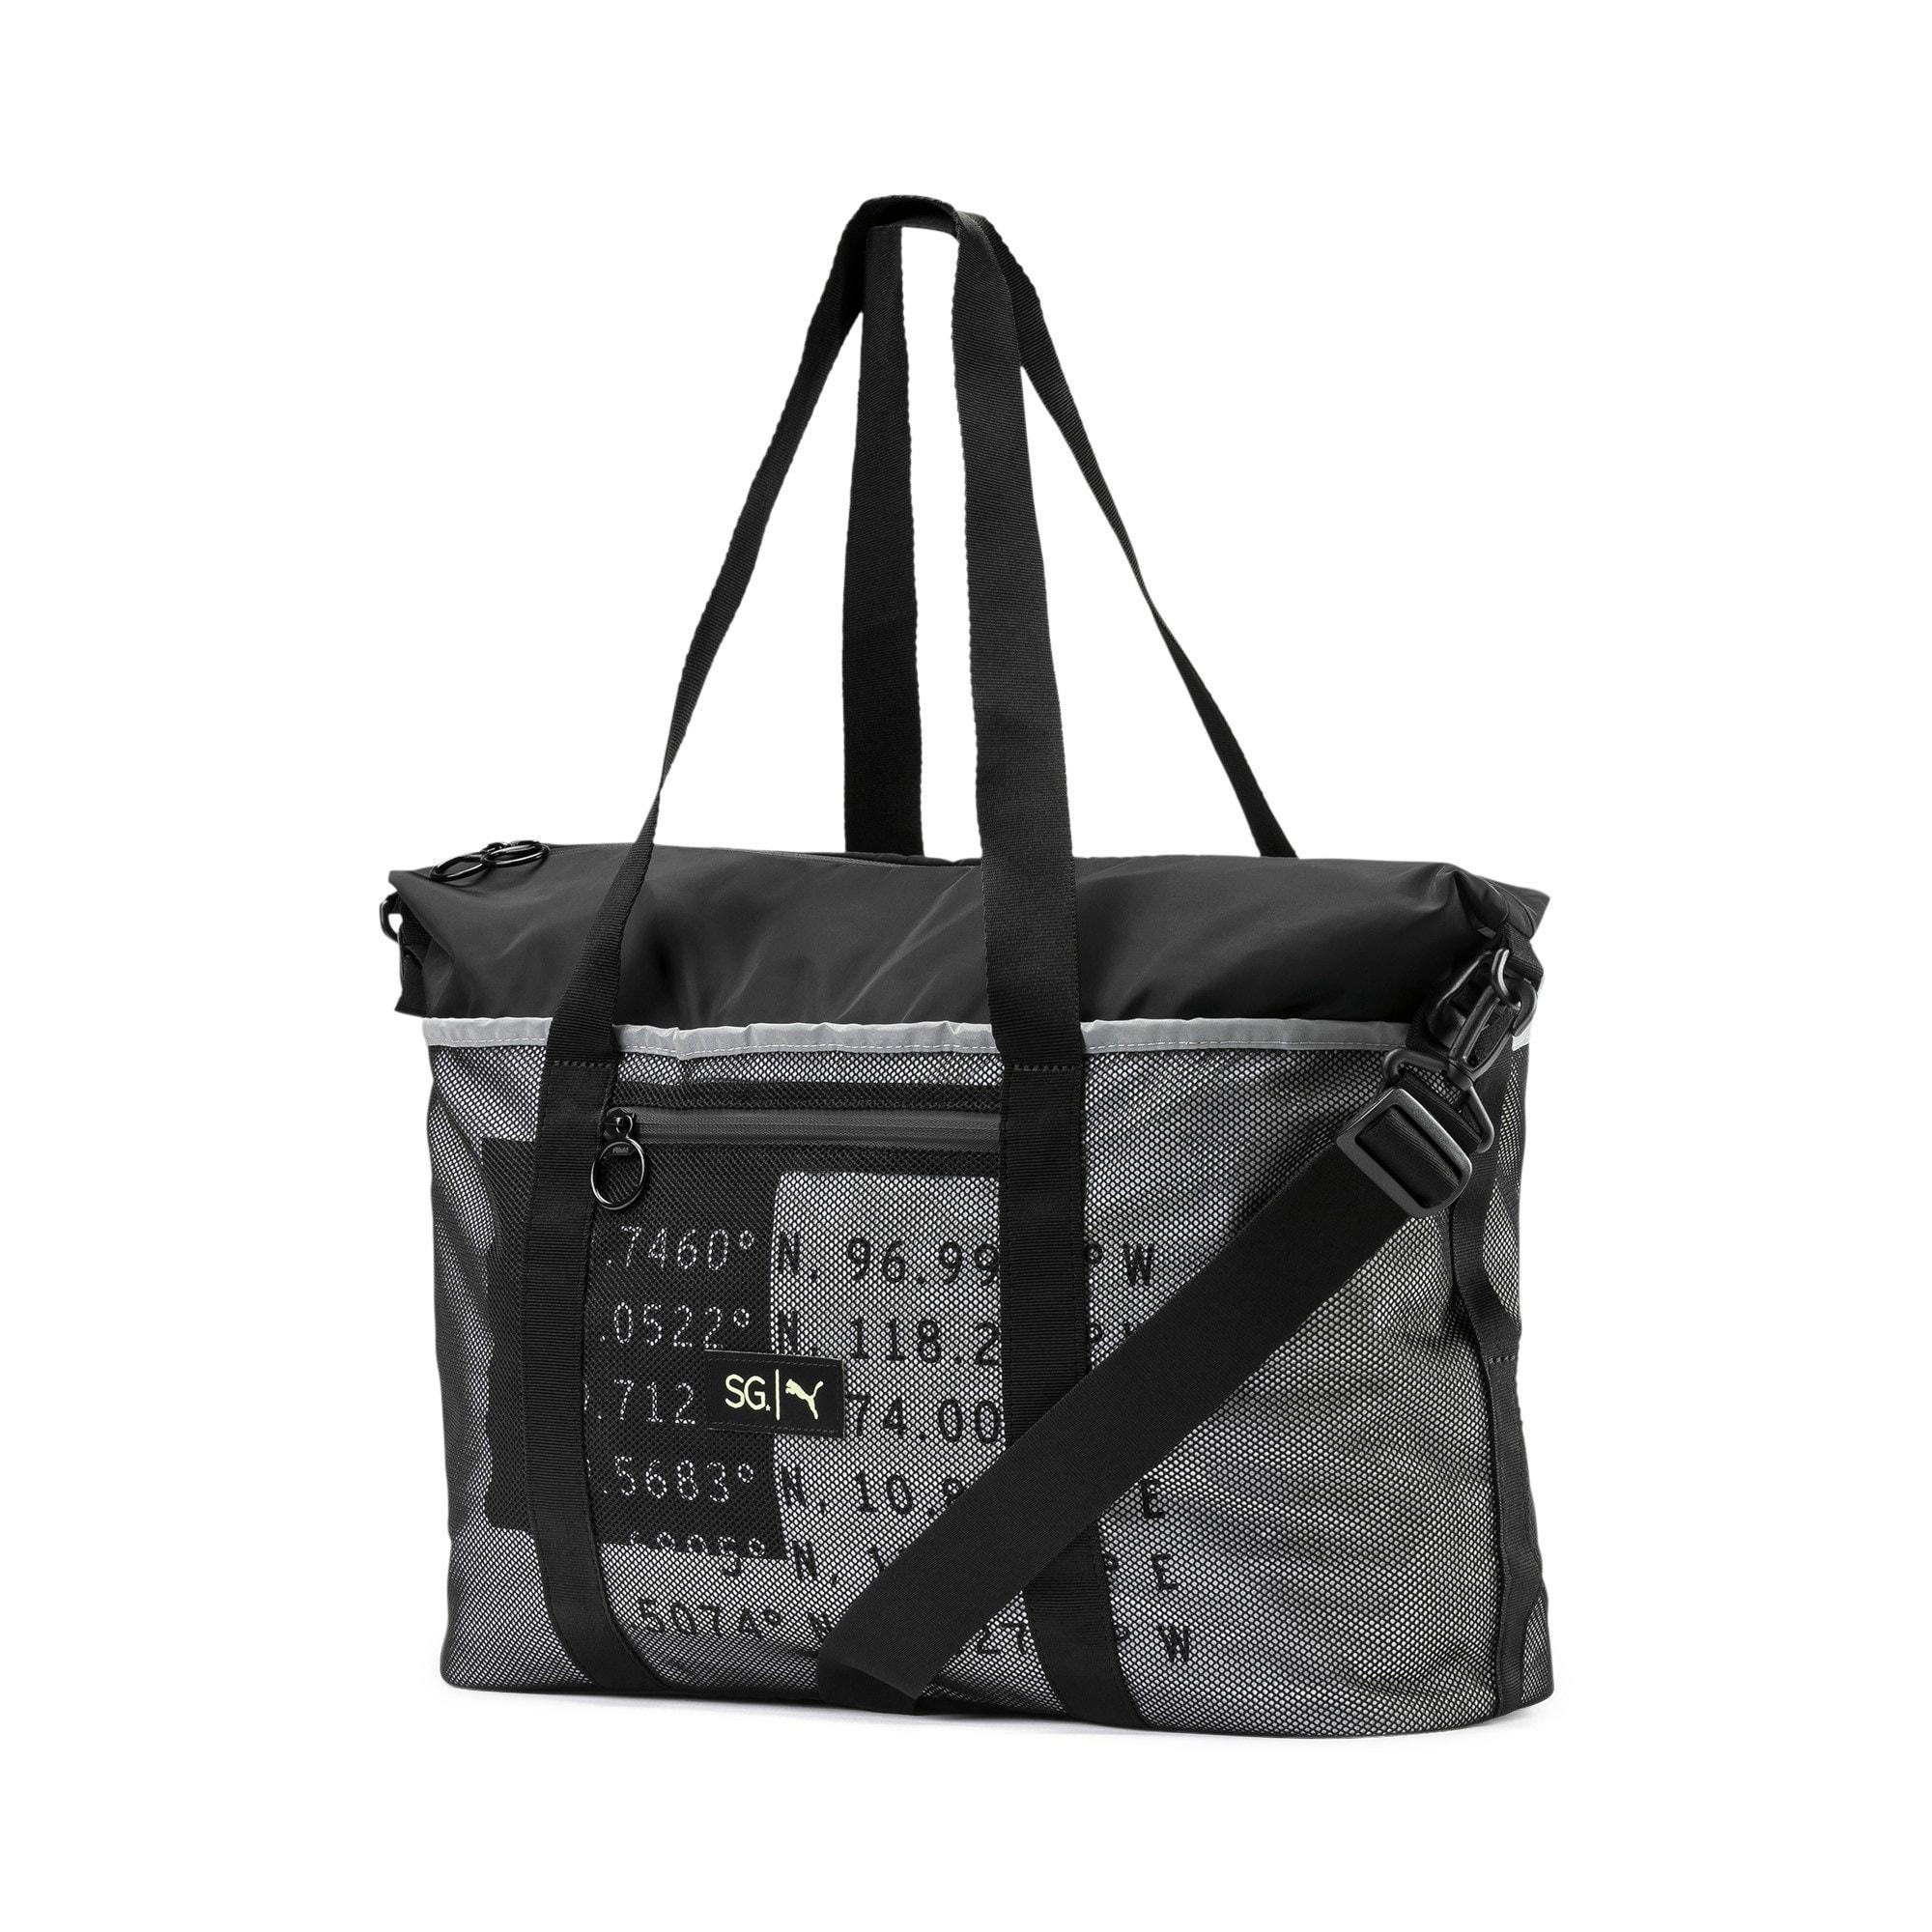 Thumbnail 1 of PUMA x SELENA GOMEZ Women's Sport Duffle Bag, Puma Black, medium